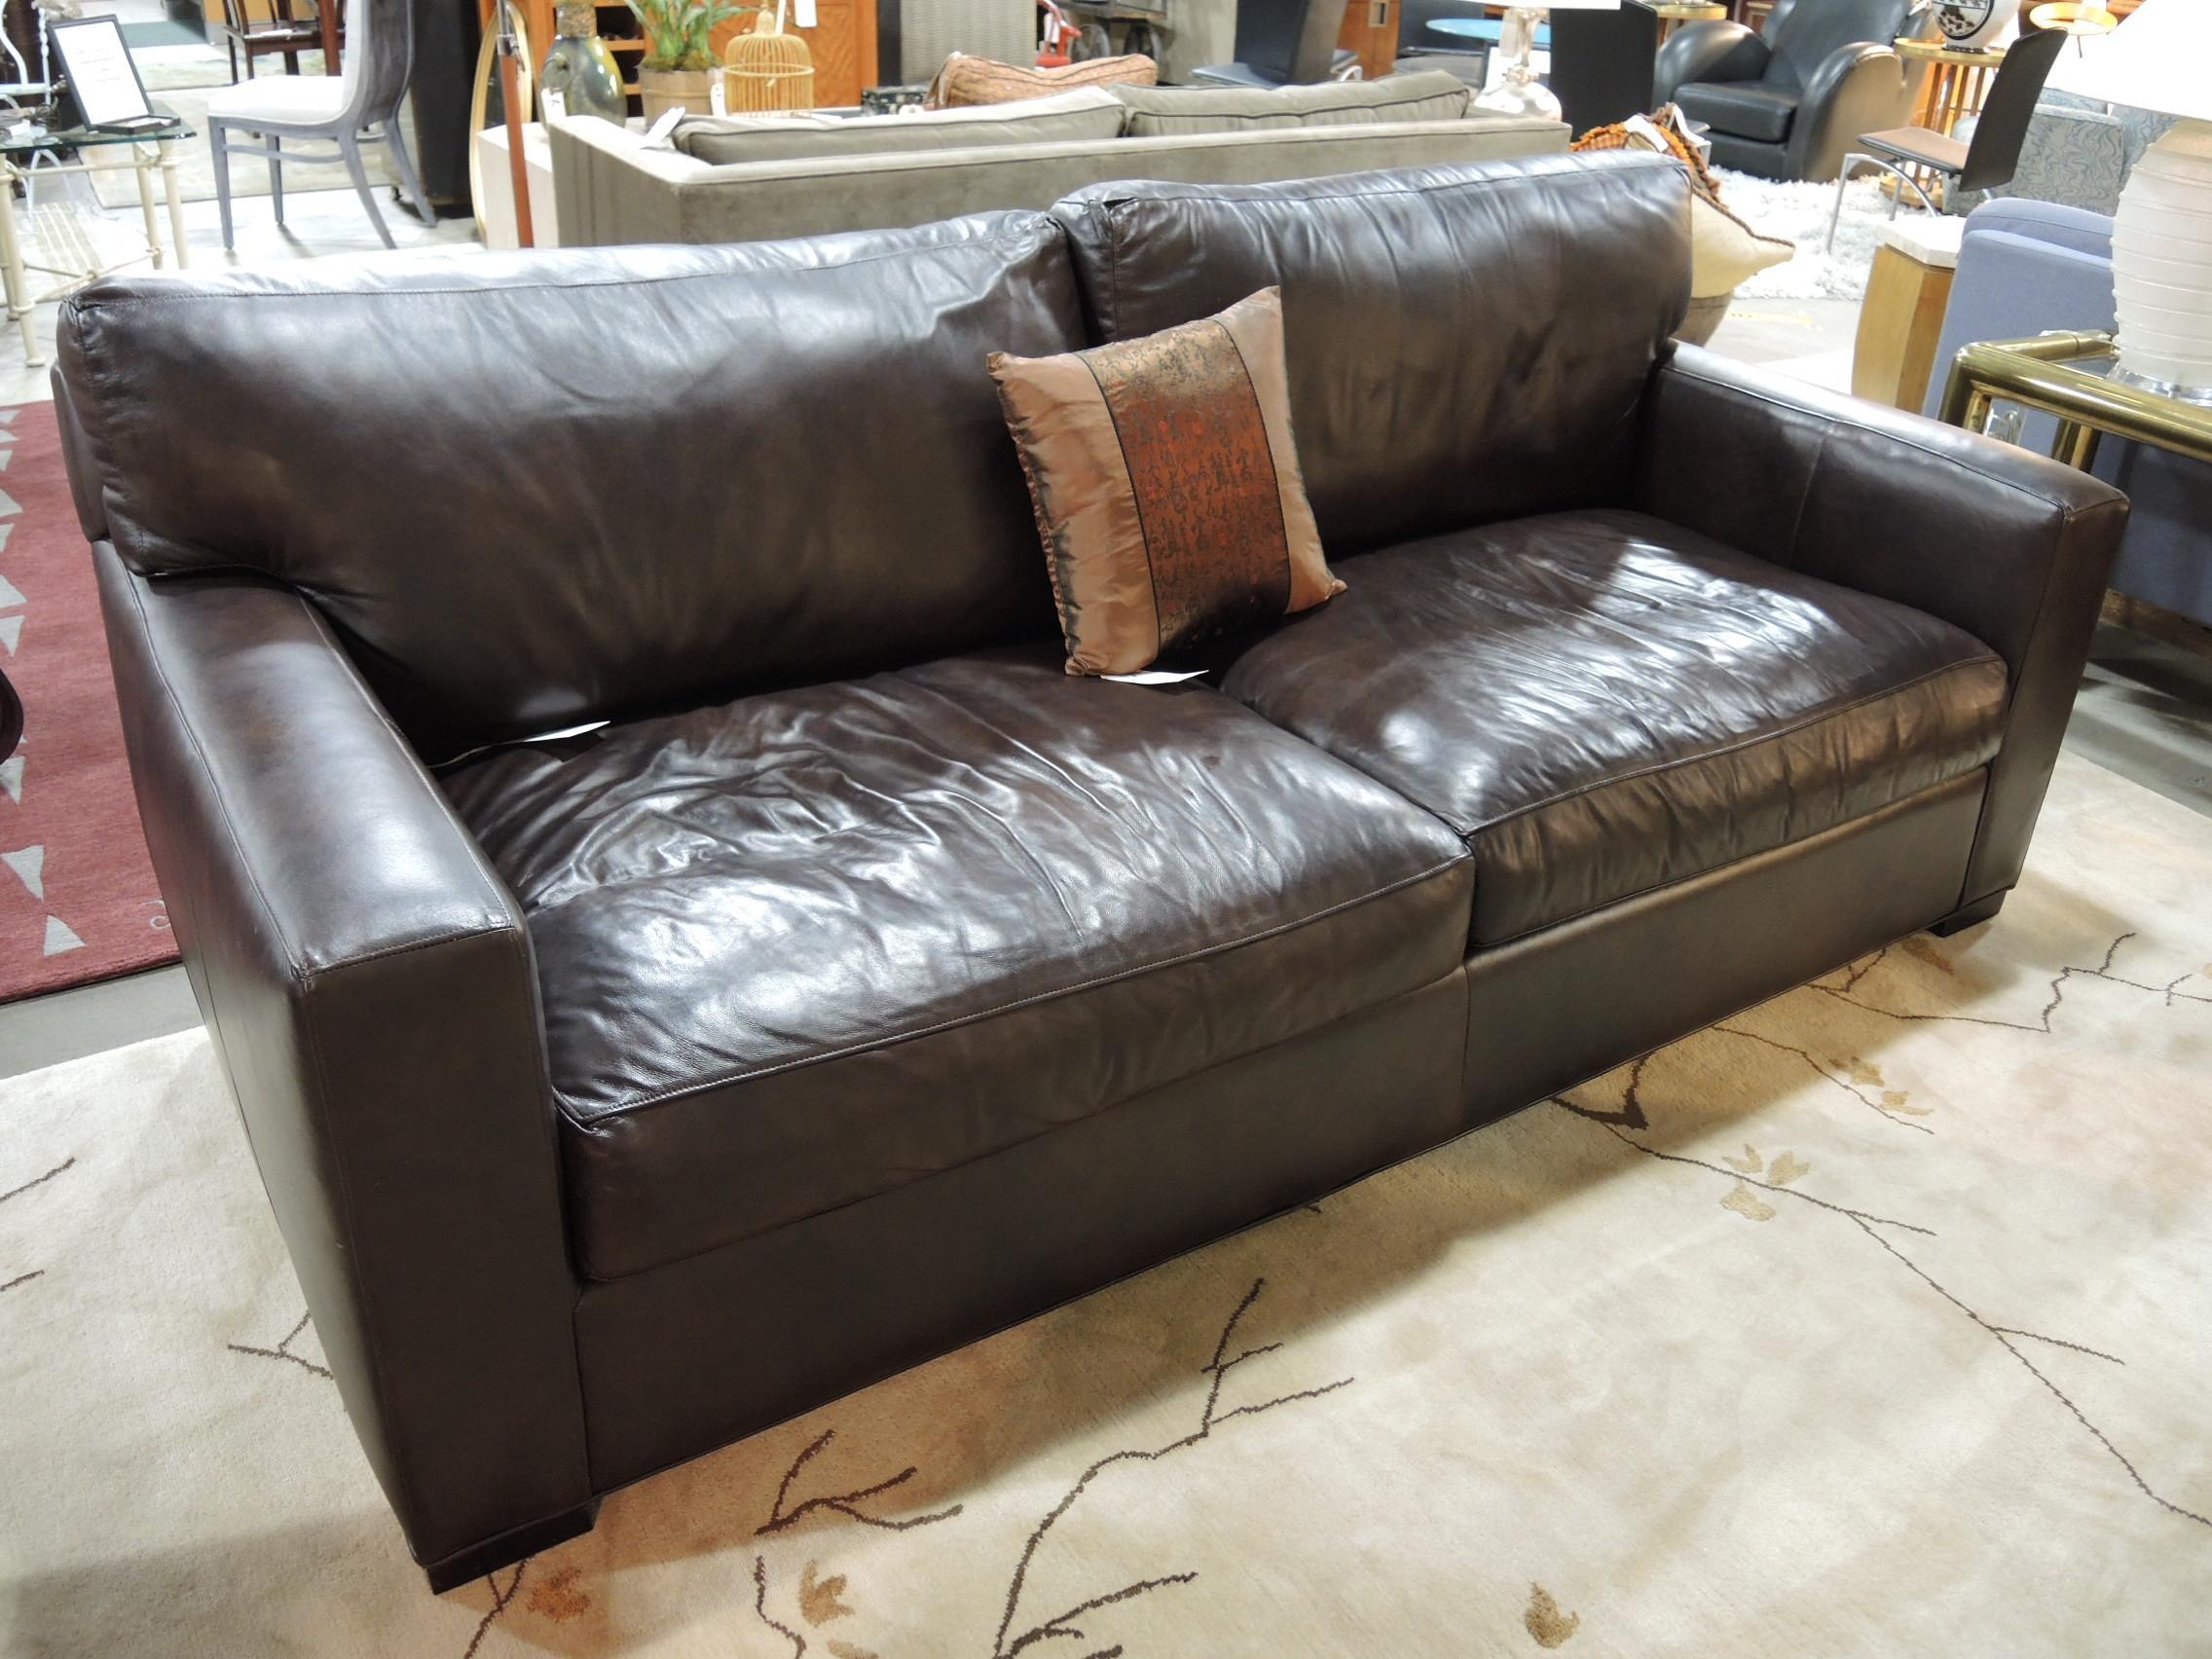 Davis Sleeper Sofa | Sofa Gallery | Kengire Regarding Crate And Barrel Sleeper Sofas (Image 7 of 20)